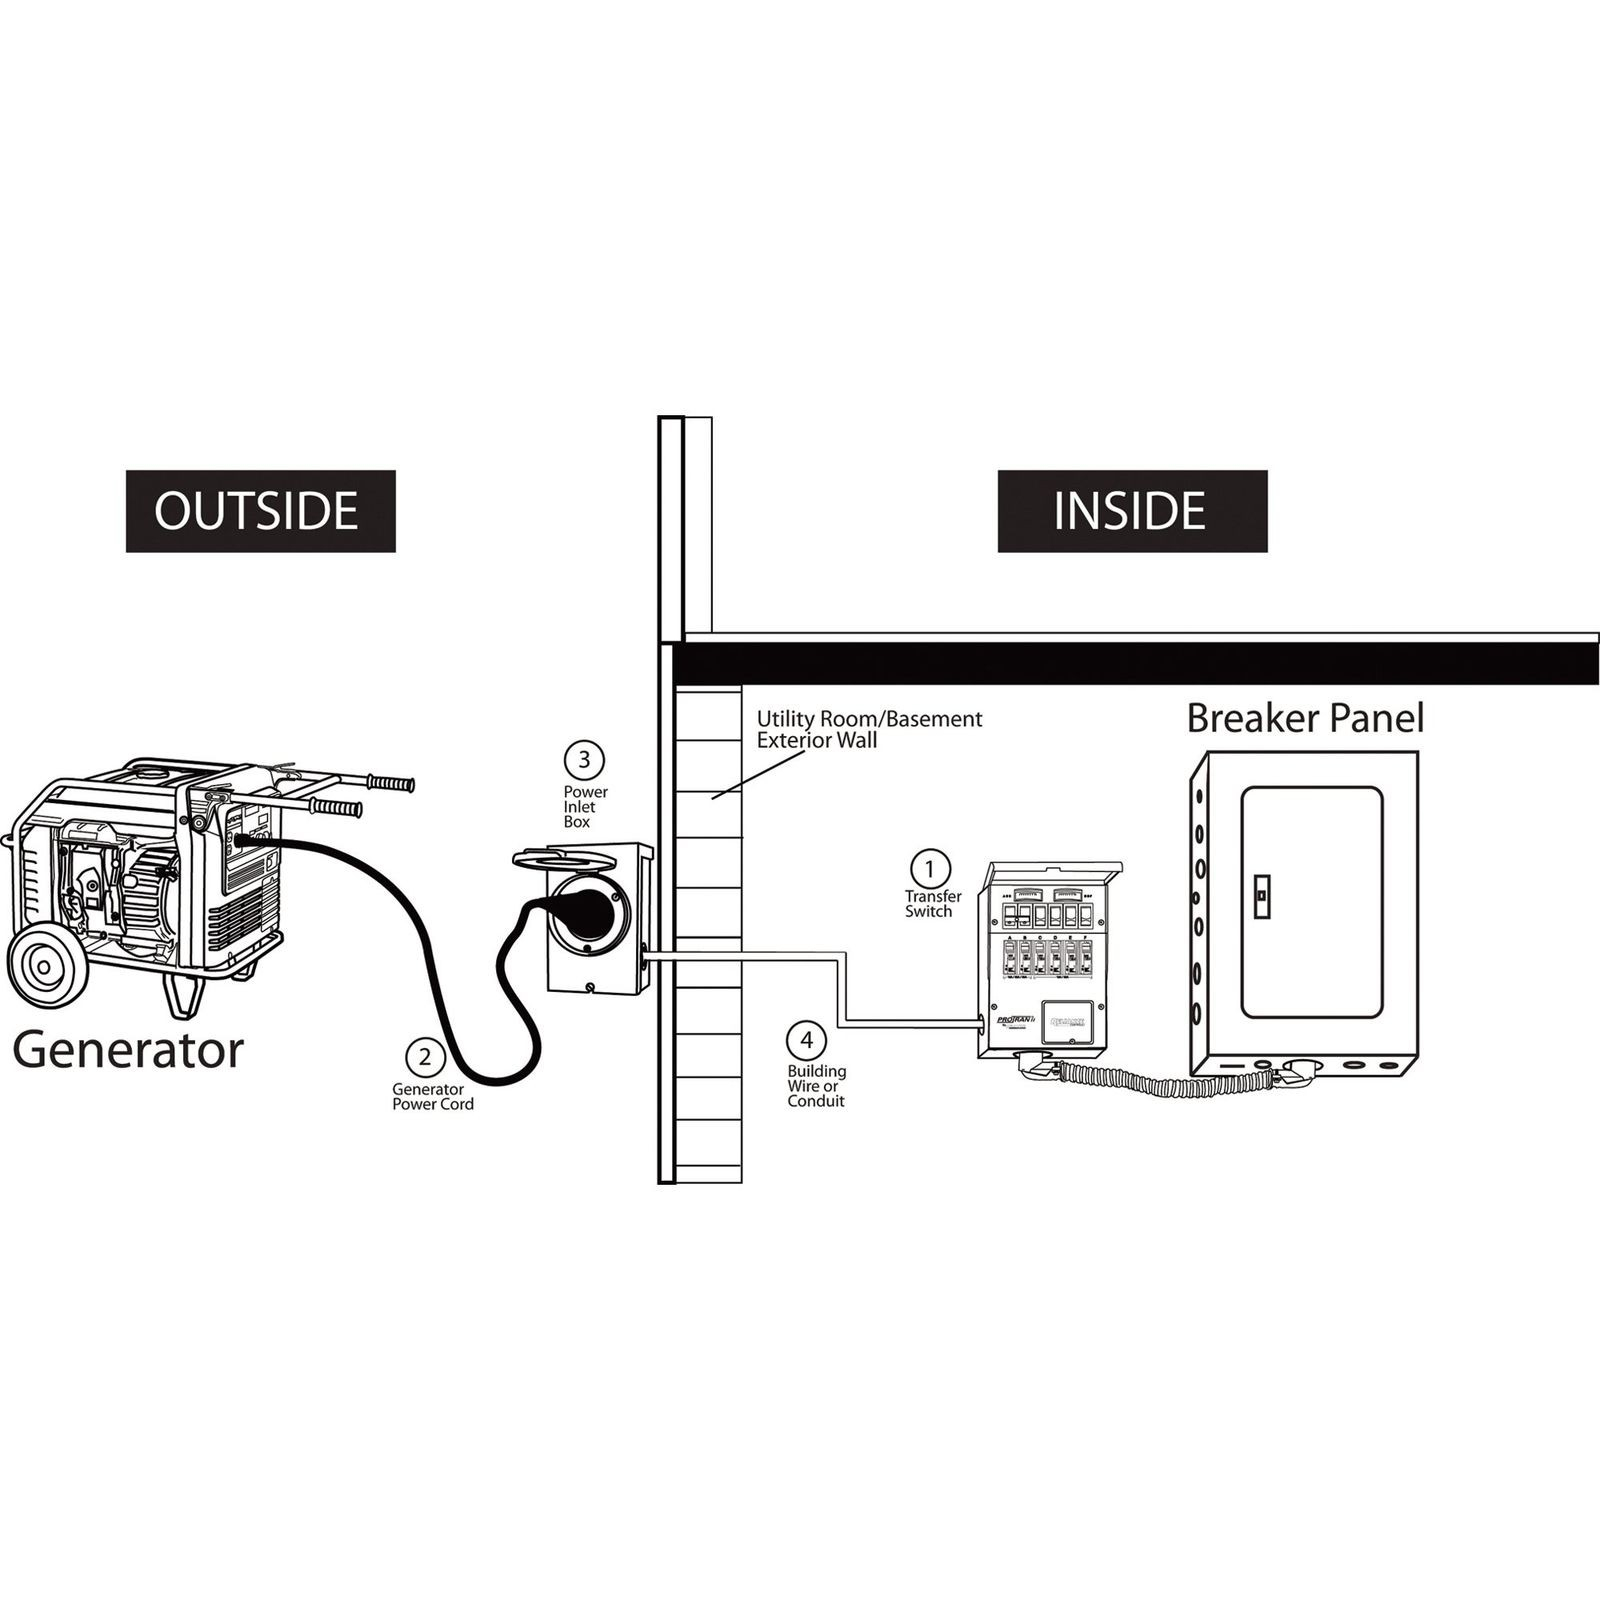 Reliance Transfer Switch Wiring Diagram   Wiring Diagram - Reliance Generator Transfer Switch Wiring Diagram